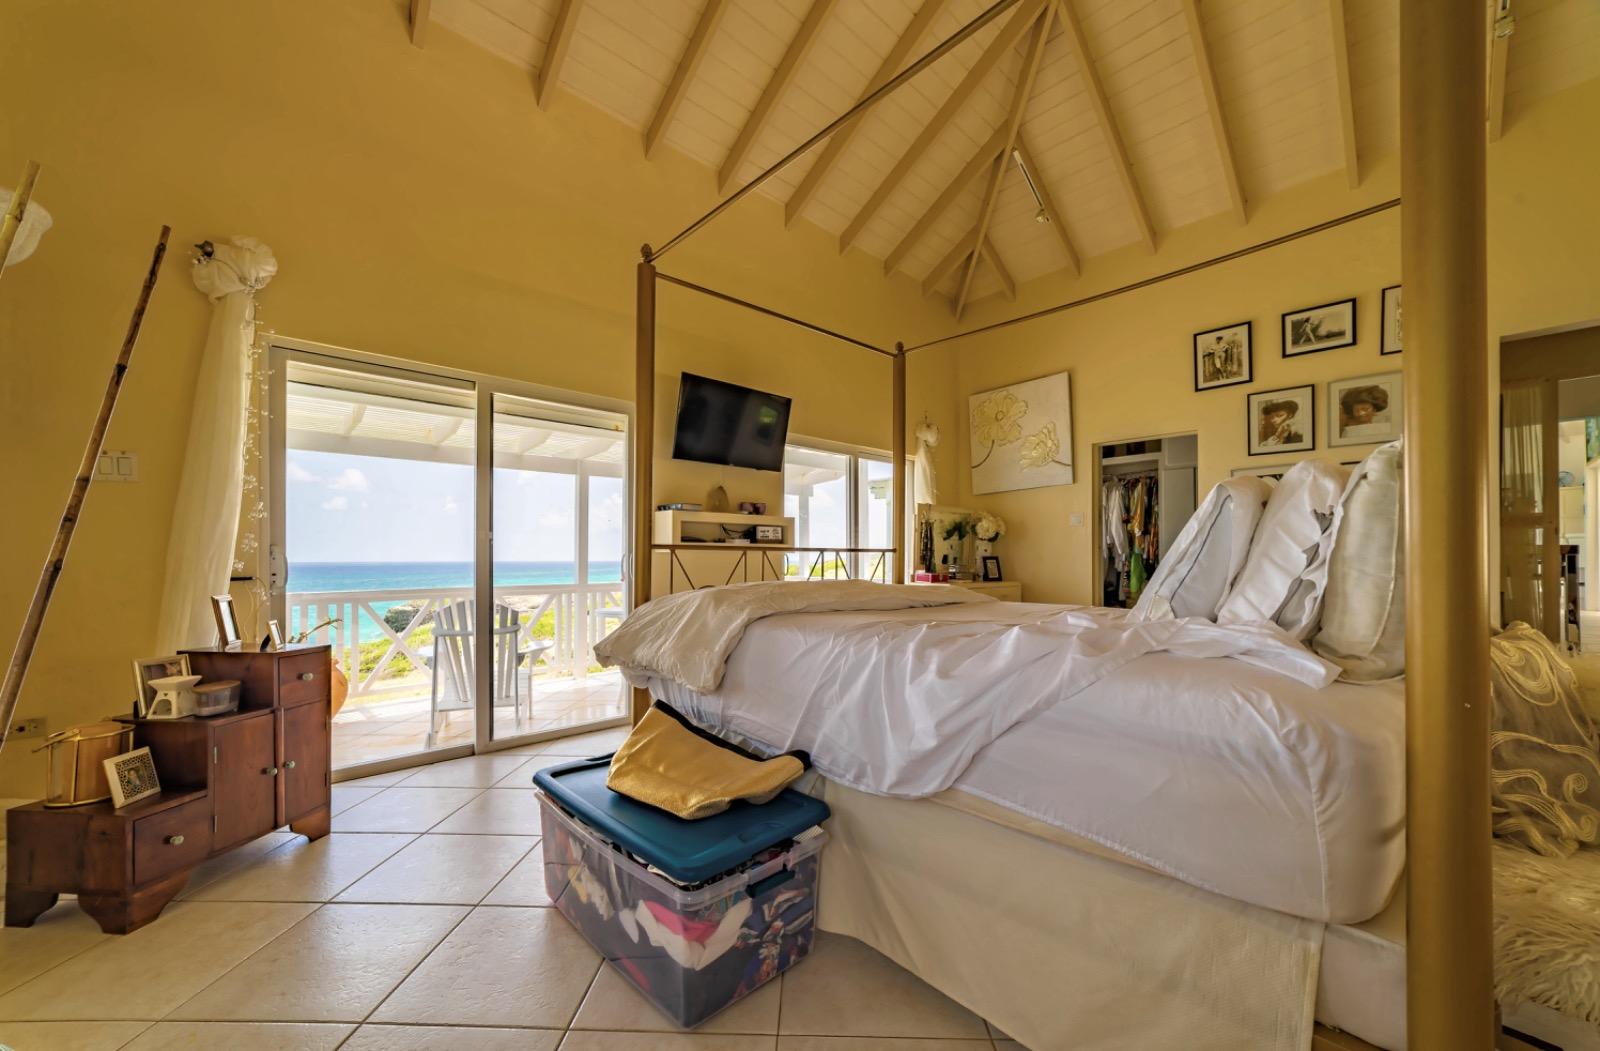 Barbados Bedroom View .jpg